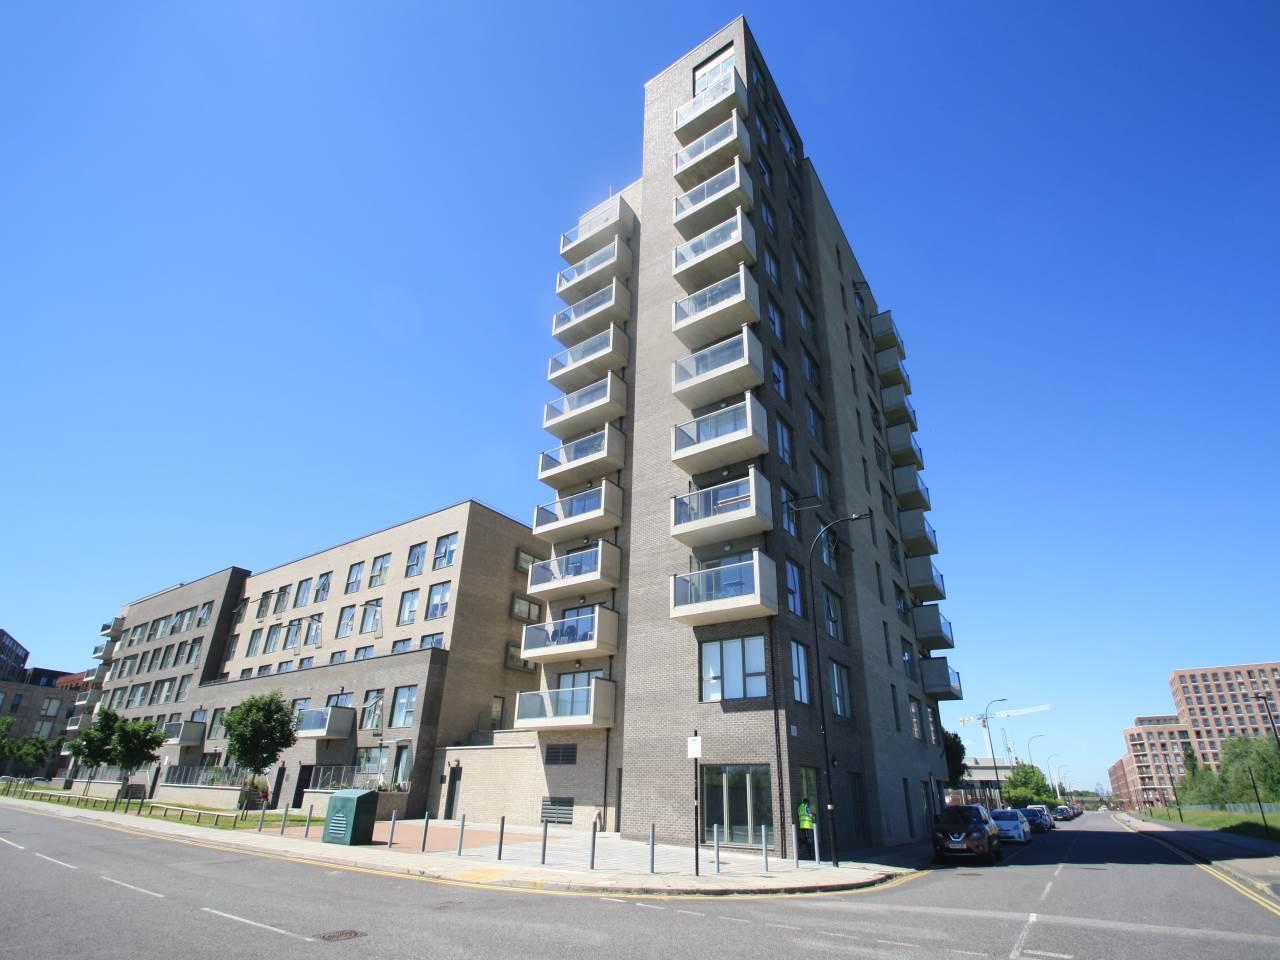 2 bed flat to rent in Magellan Boulevard, Royal Docks, E16